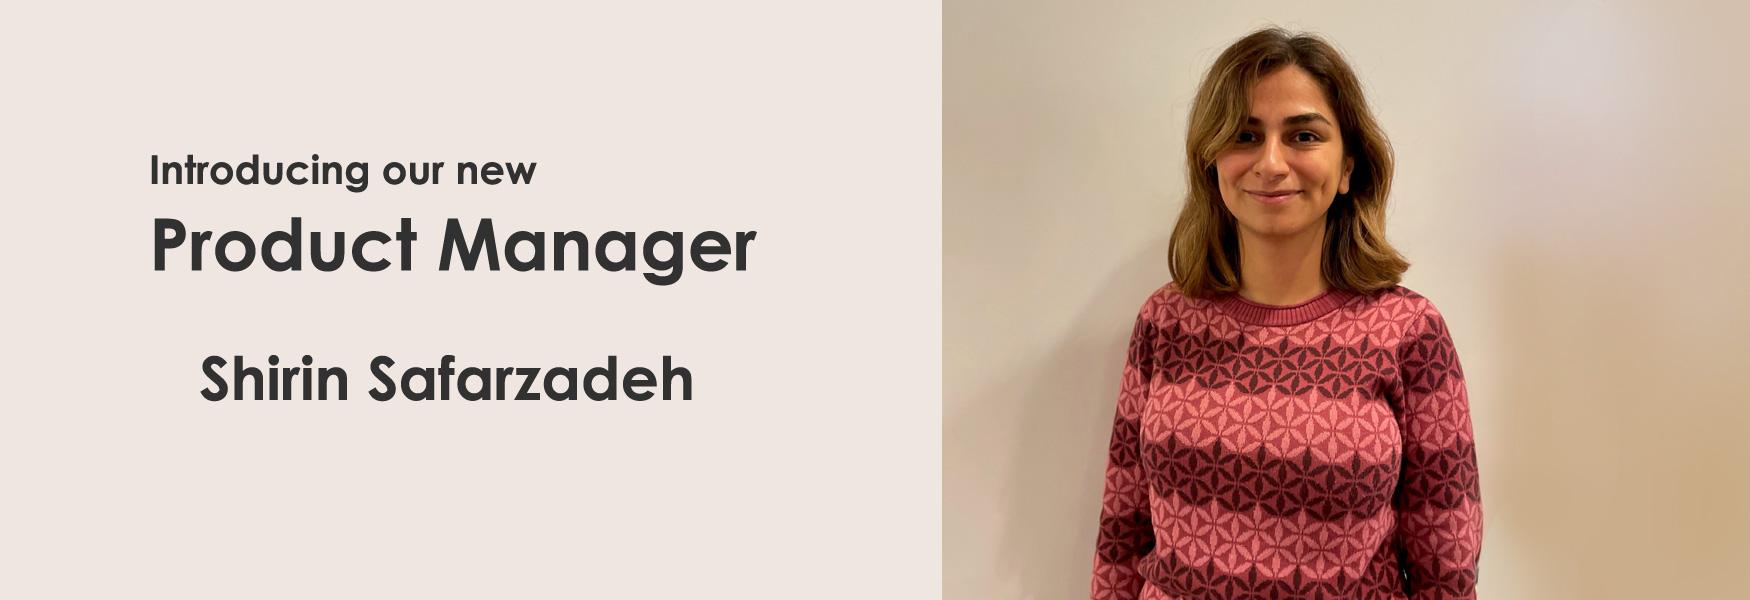 Employee - Product Manager - Shirin Safarzadeh